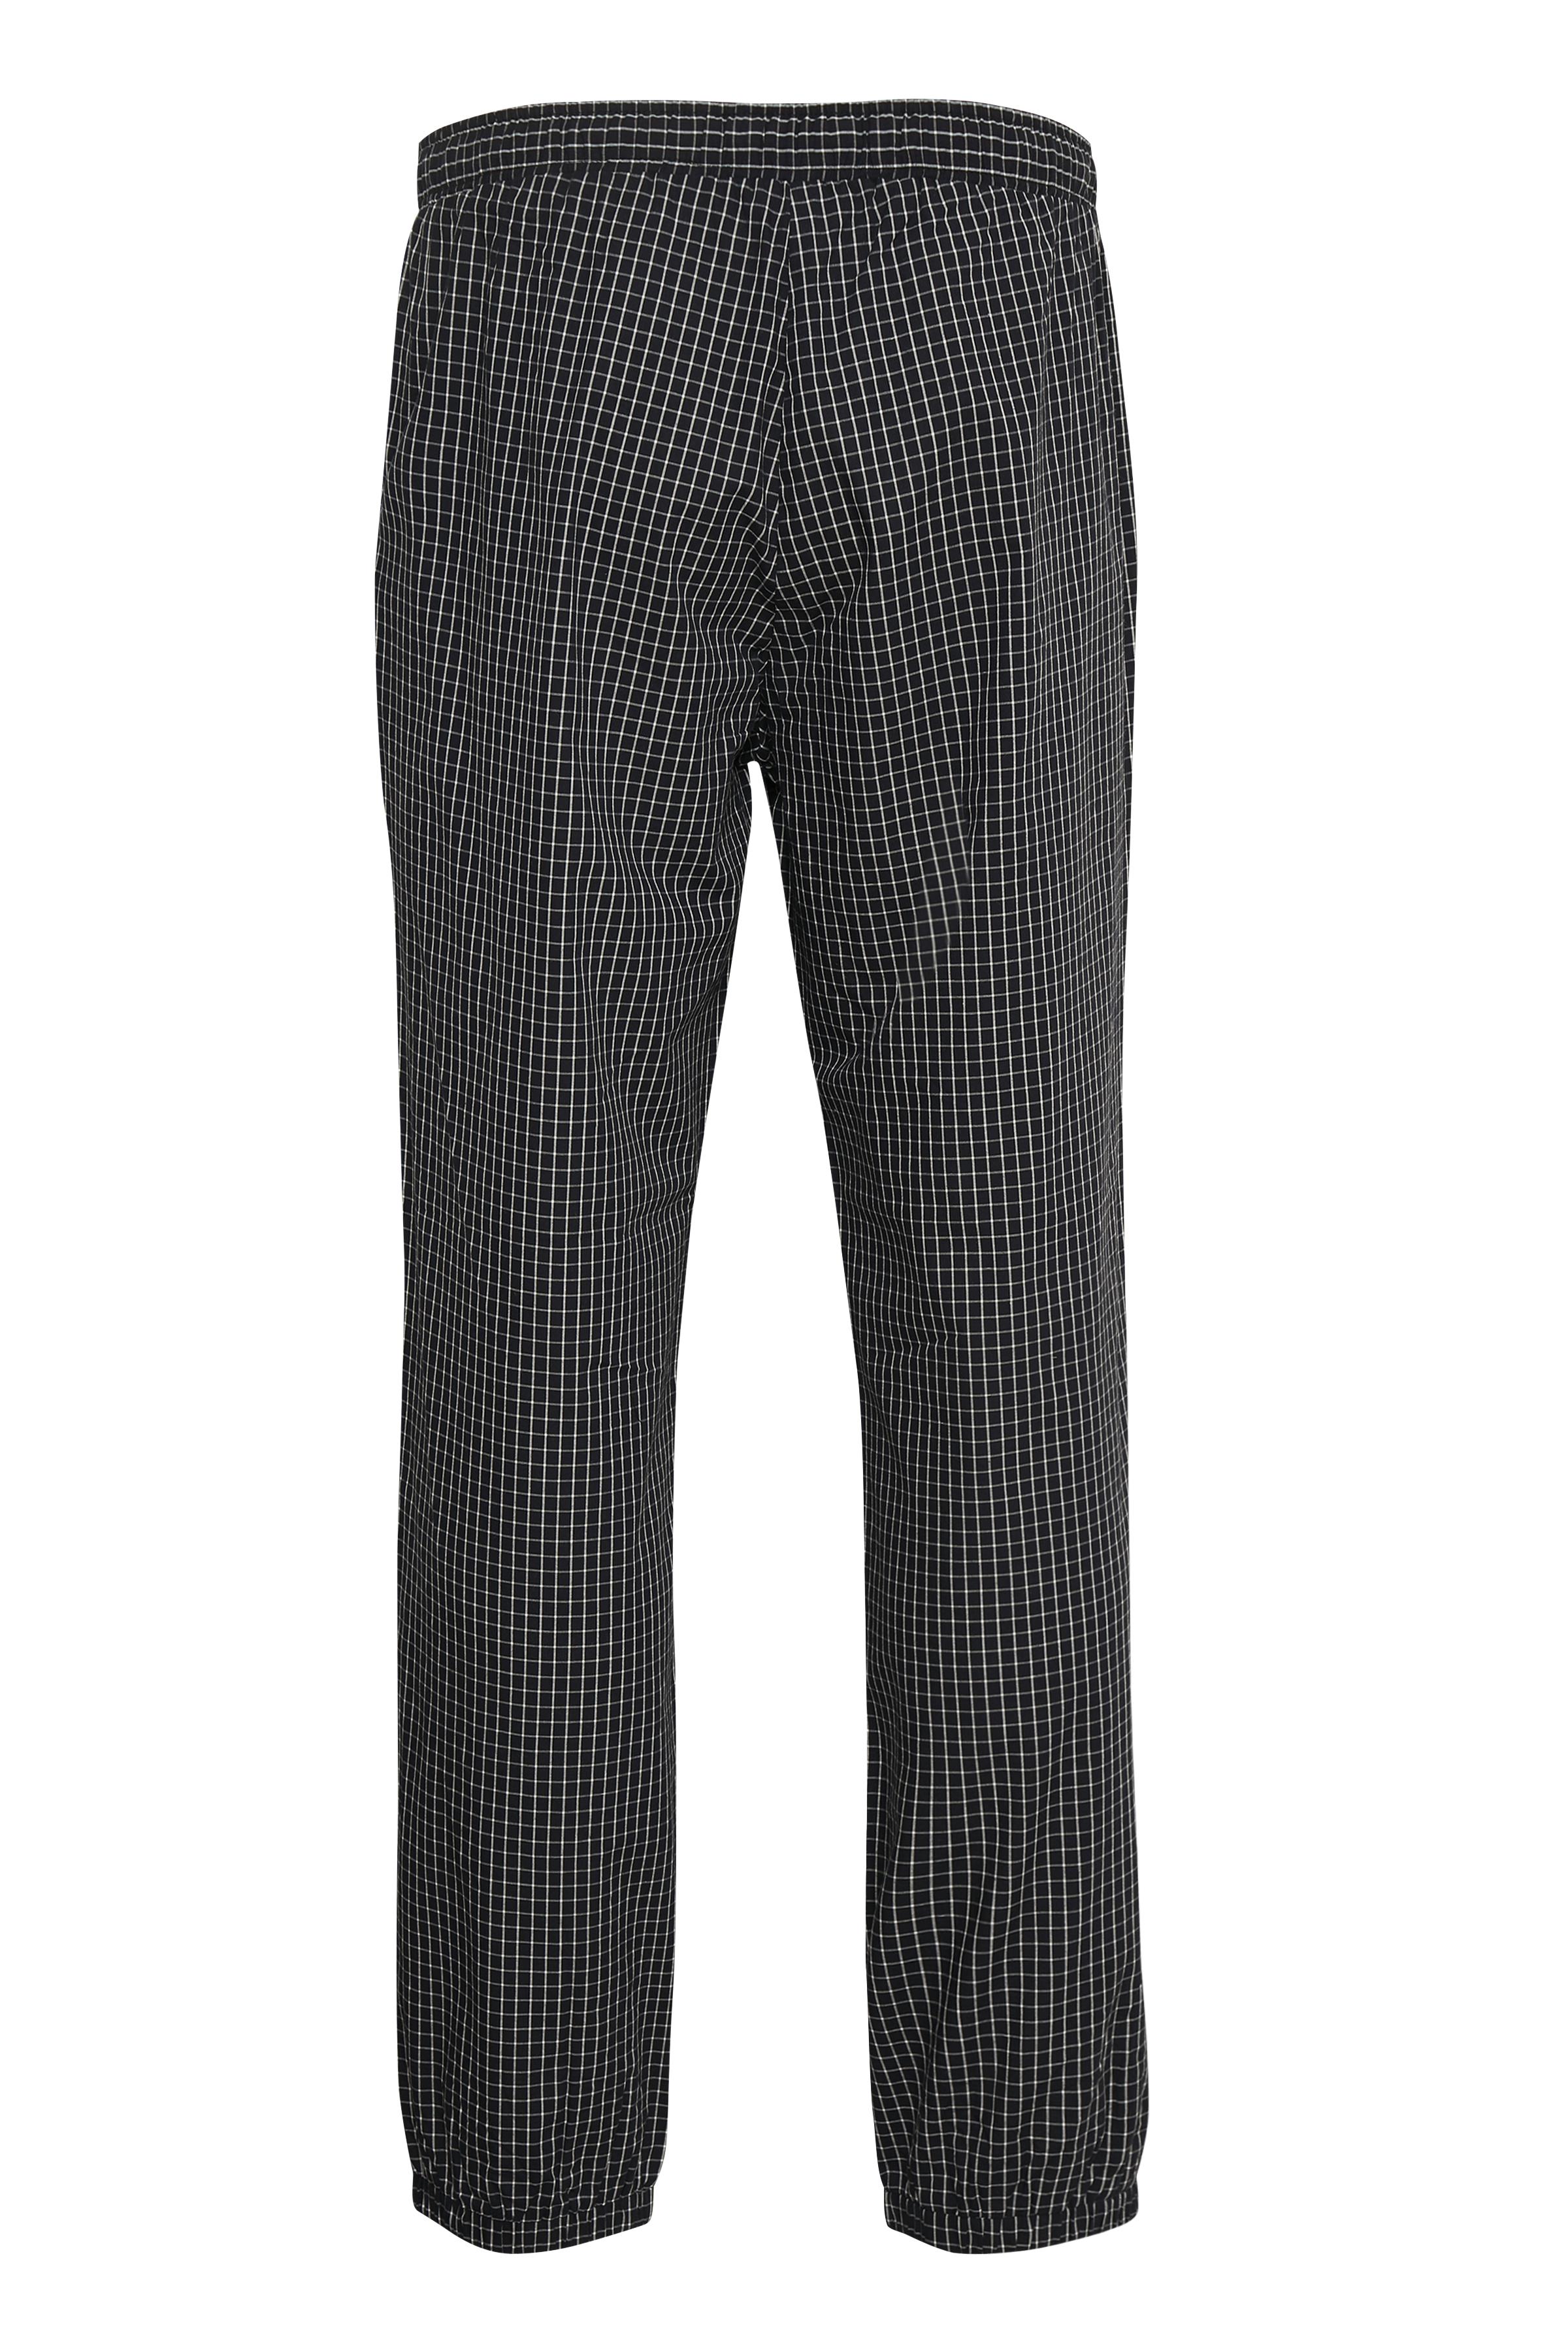 Dark Navy Gordy Pyjamas Bukser – Køb Dark Navy Gordy Pyjamas Bukser fra str. S-XXL her